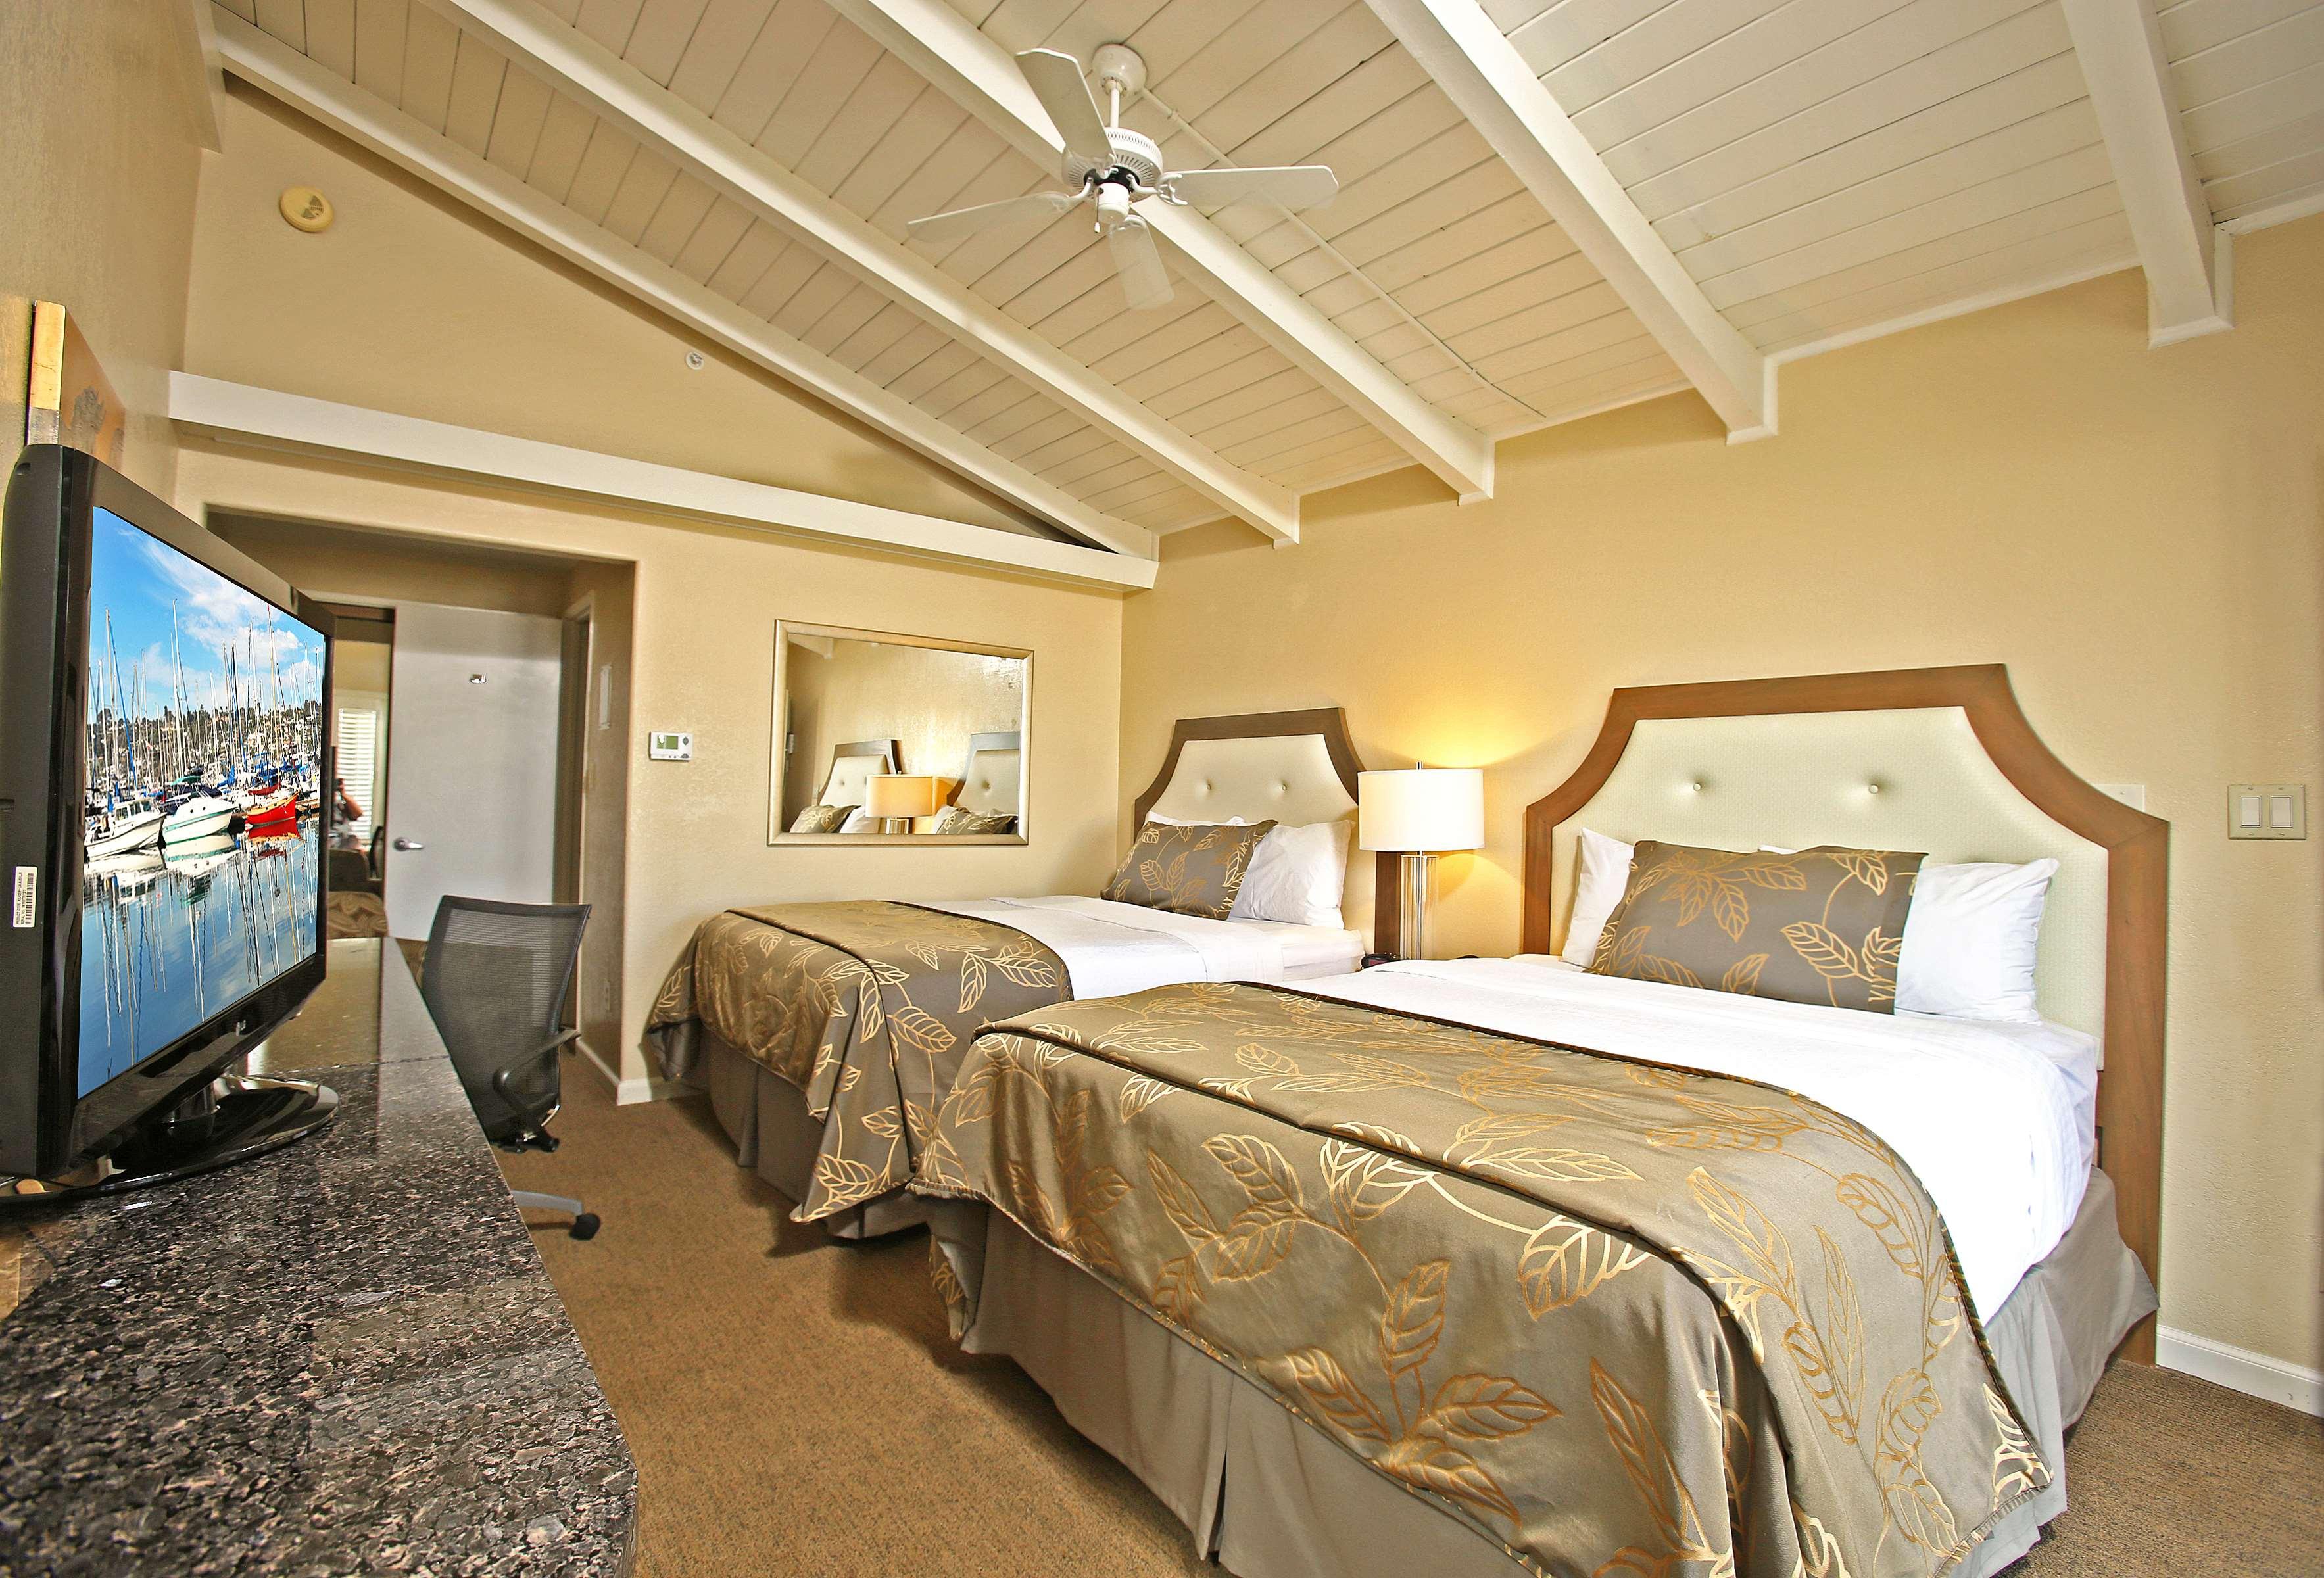 Best Western Plus Island Palms Hotel & Marina image 10